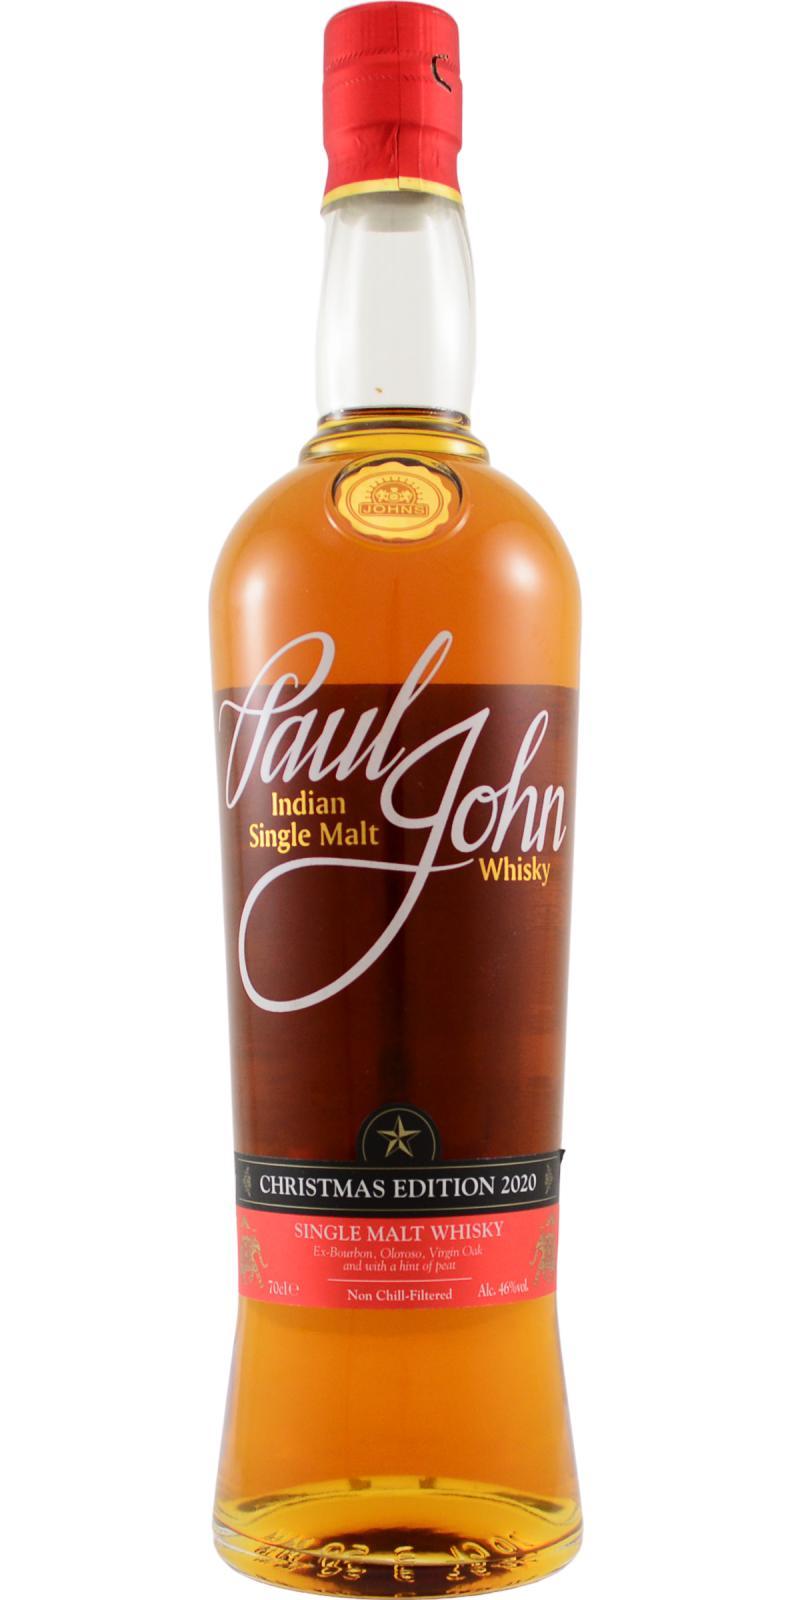 Paul John Christmas Edition 2020